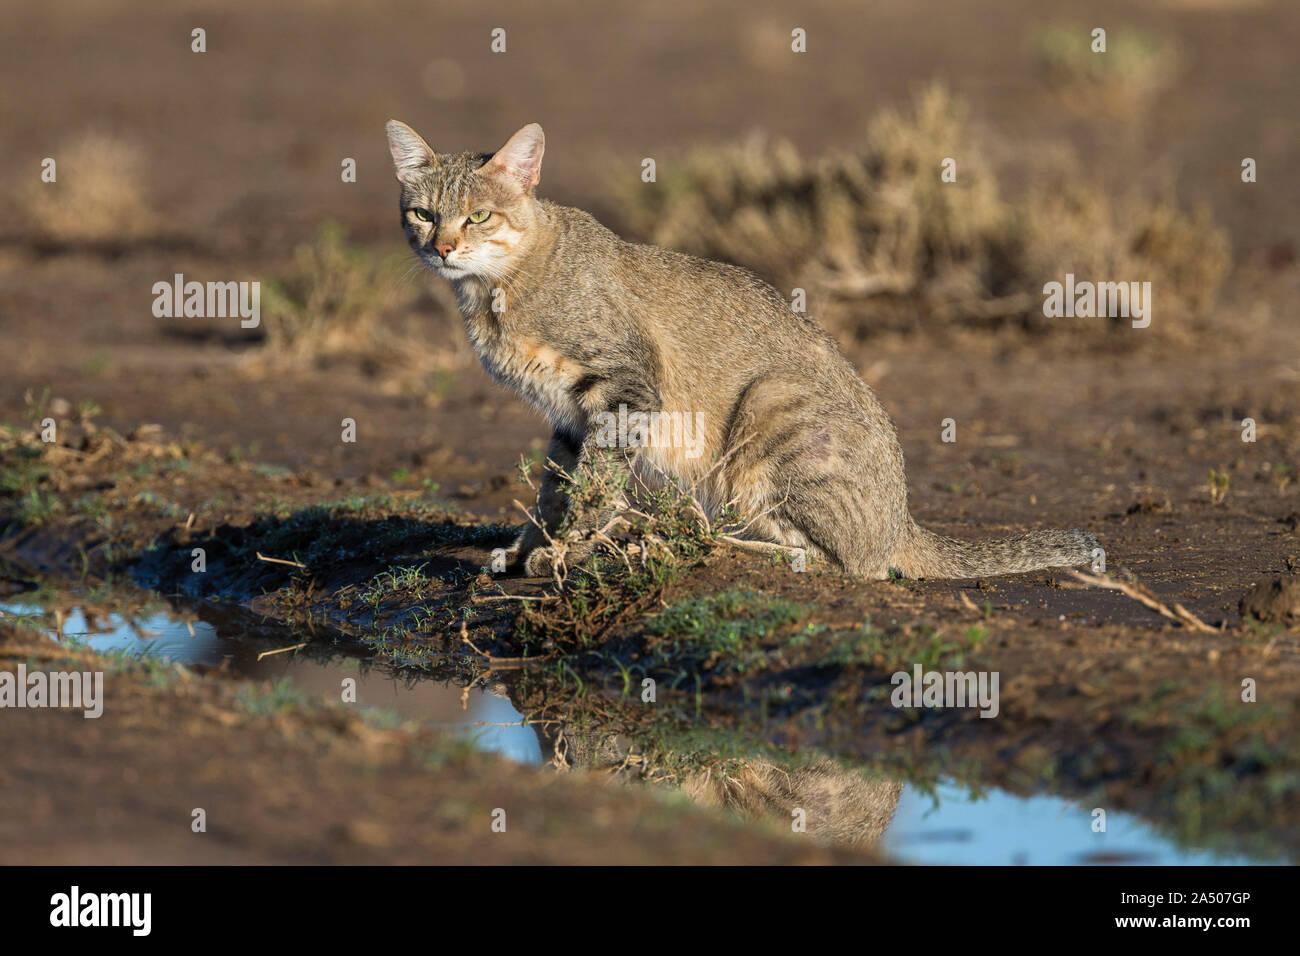 African wildcat (Felis lybica), Kgalagadi Transfrontier Park, South Africa, Stock Photo